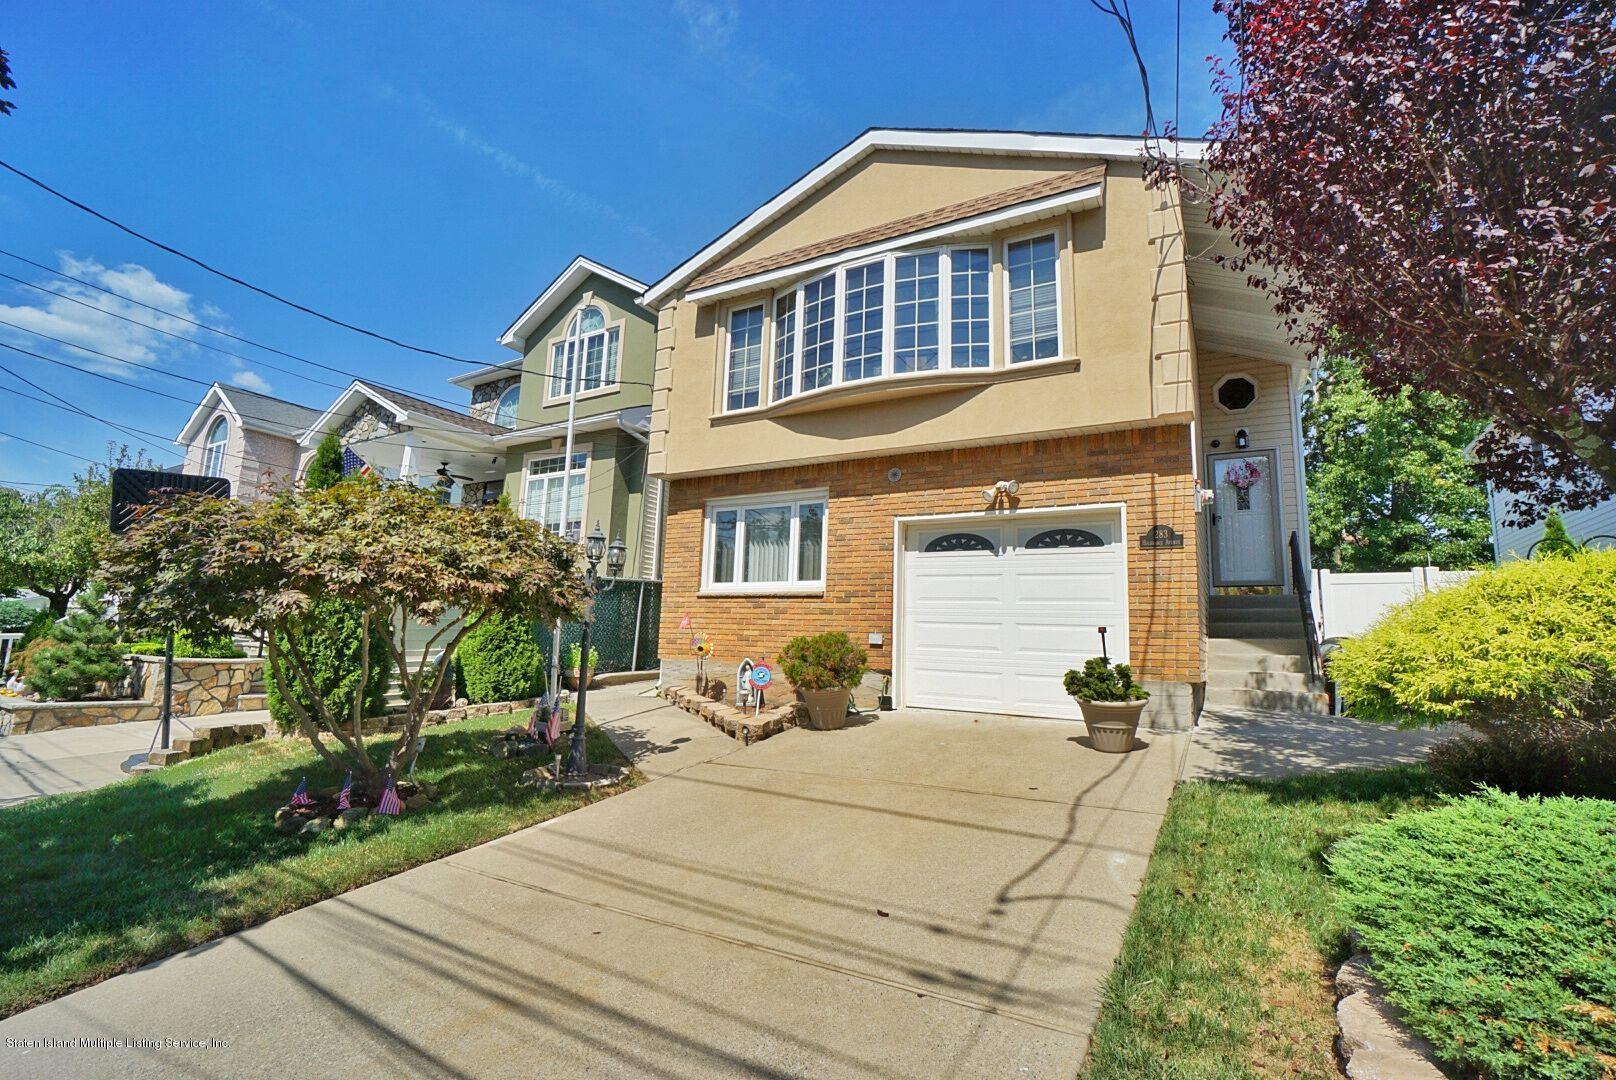 Single Family - Detached 283 Holdridge Avenue  Staten Island, NY 10312, MLS-1130000-36